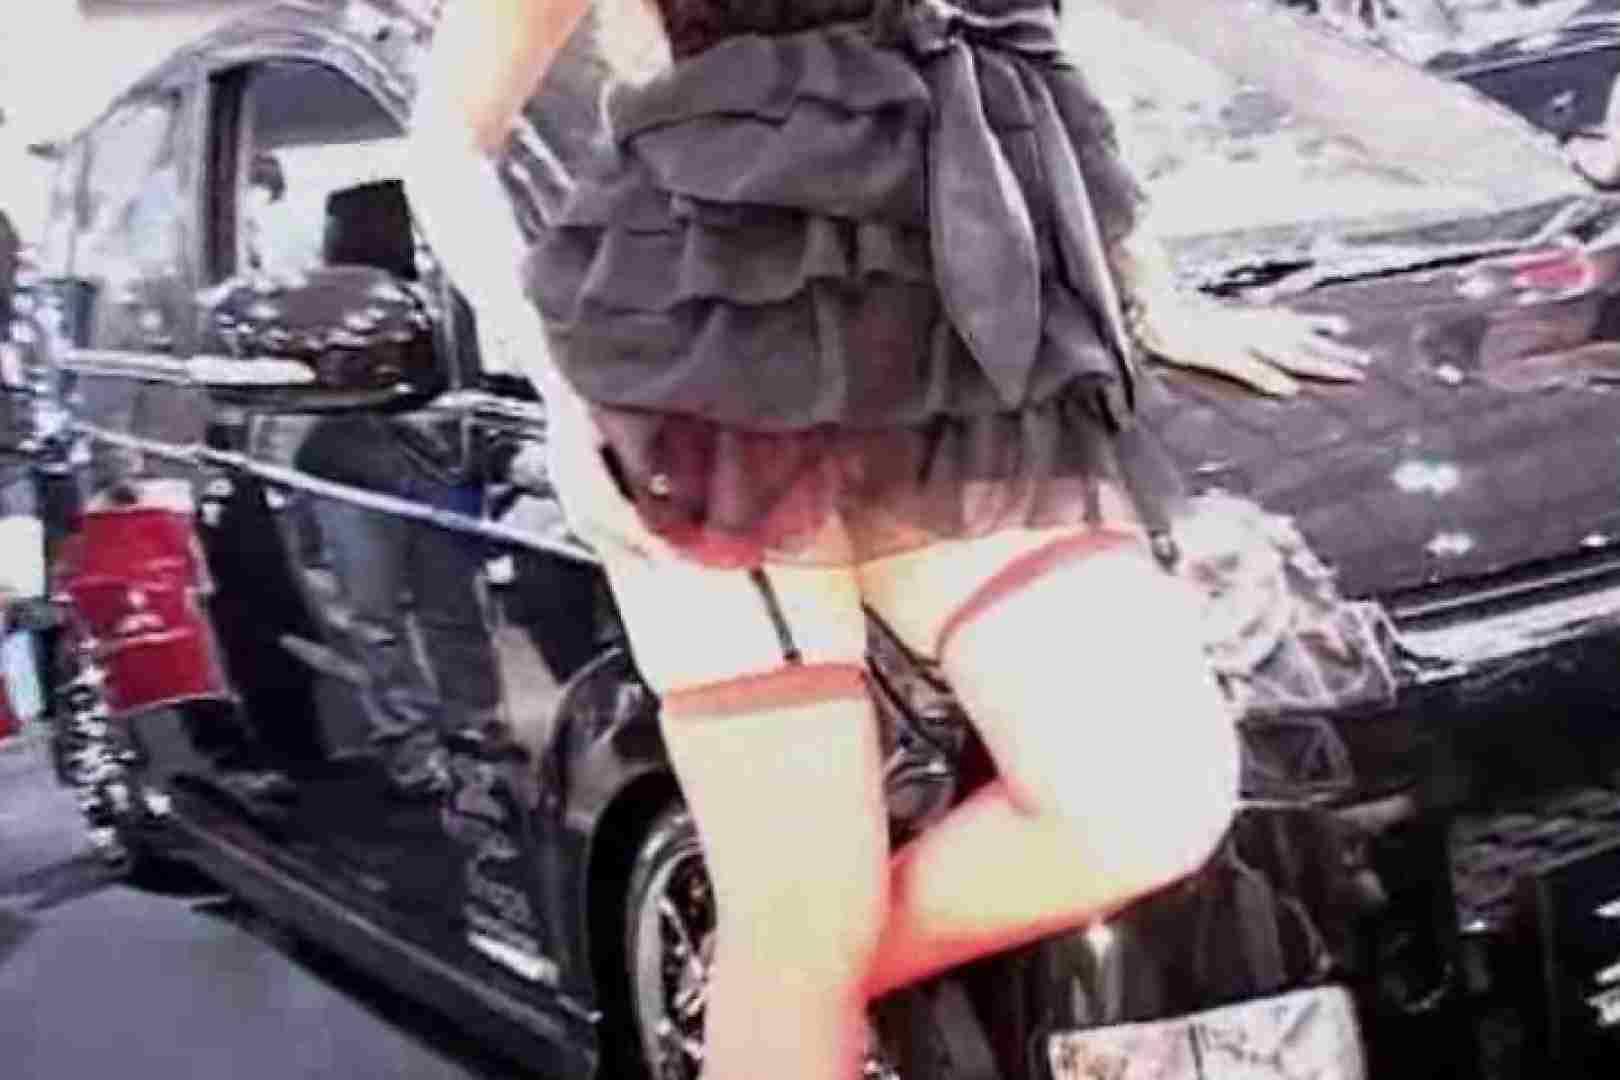 RQカメラ地獄Vol.35 現役ギャル 盗撮動画紹介 105pic 67